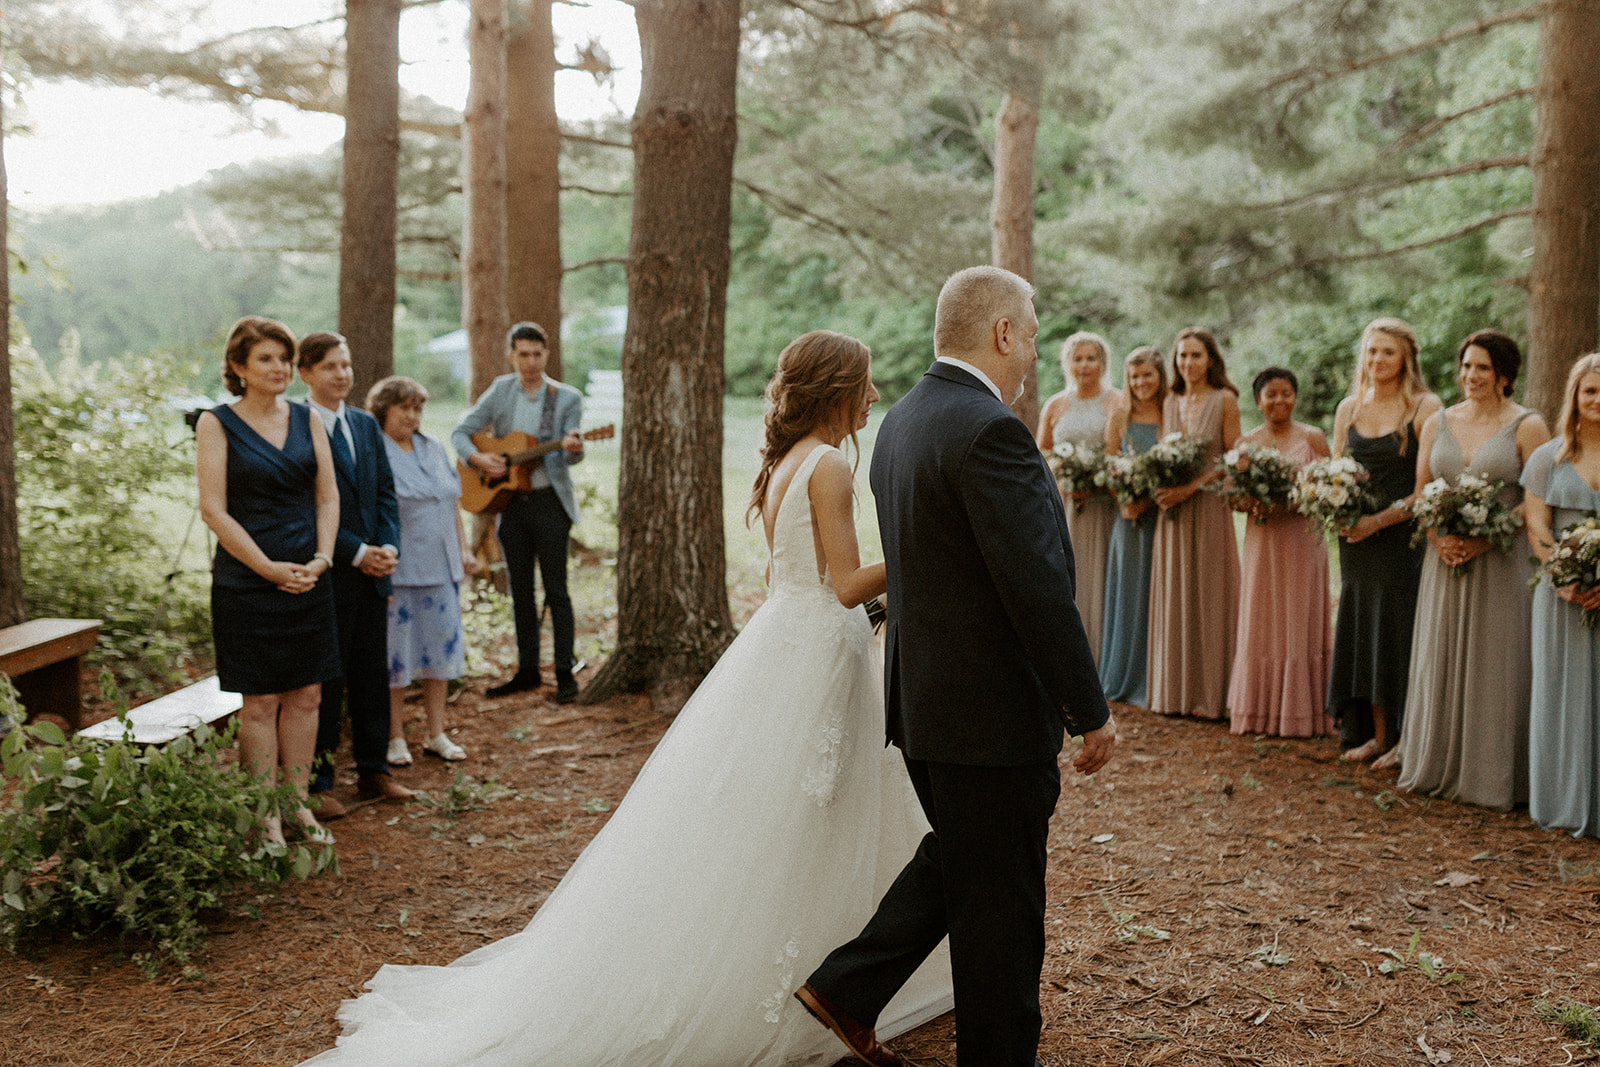 camp_wokanda_peoria_illinois_wedding_photographer_wright_photographs_bliese_0207.jpg